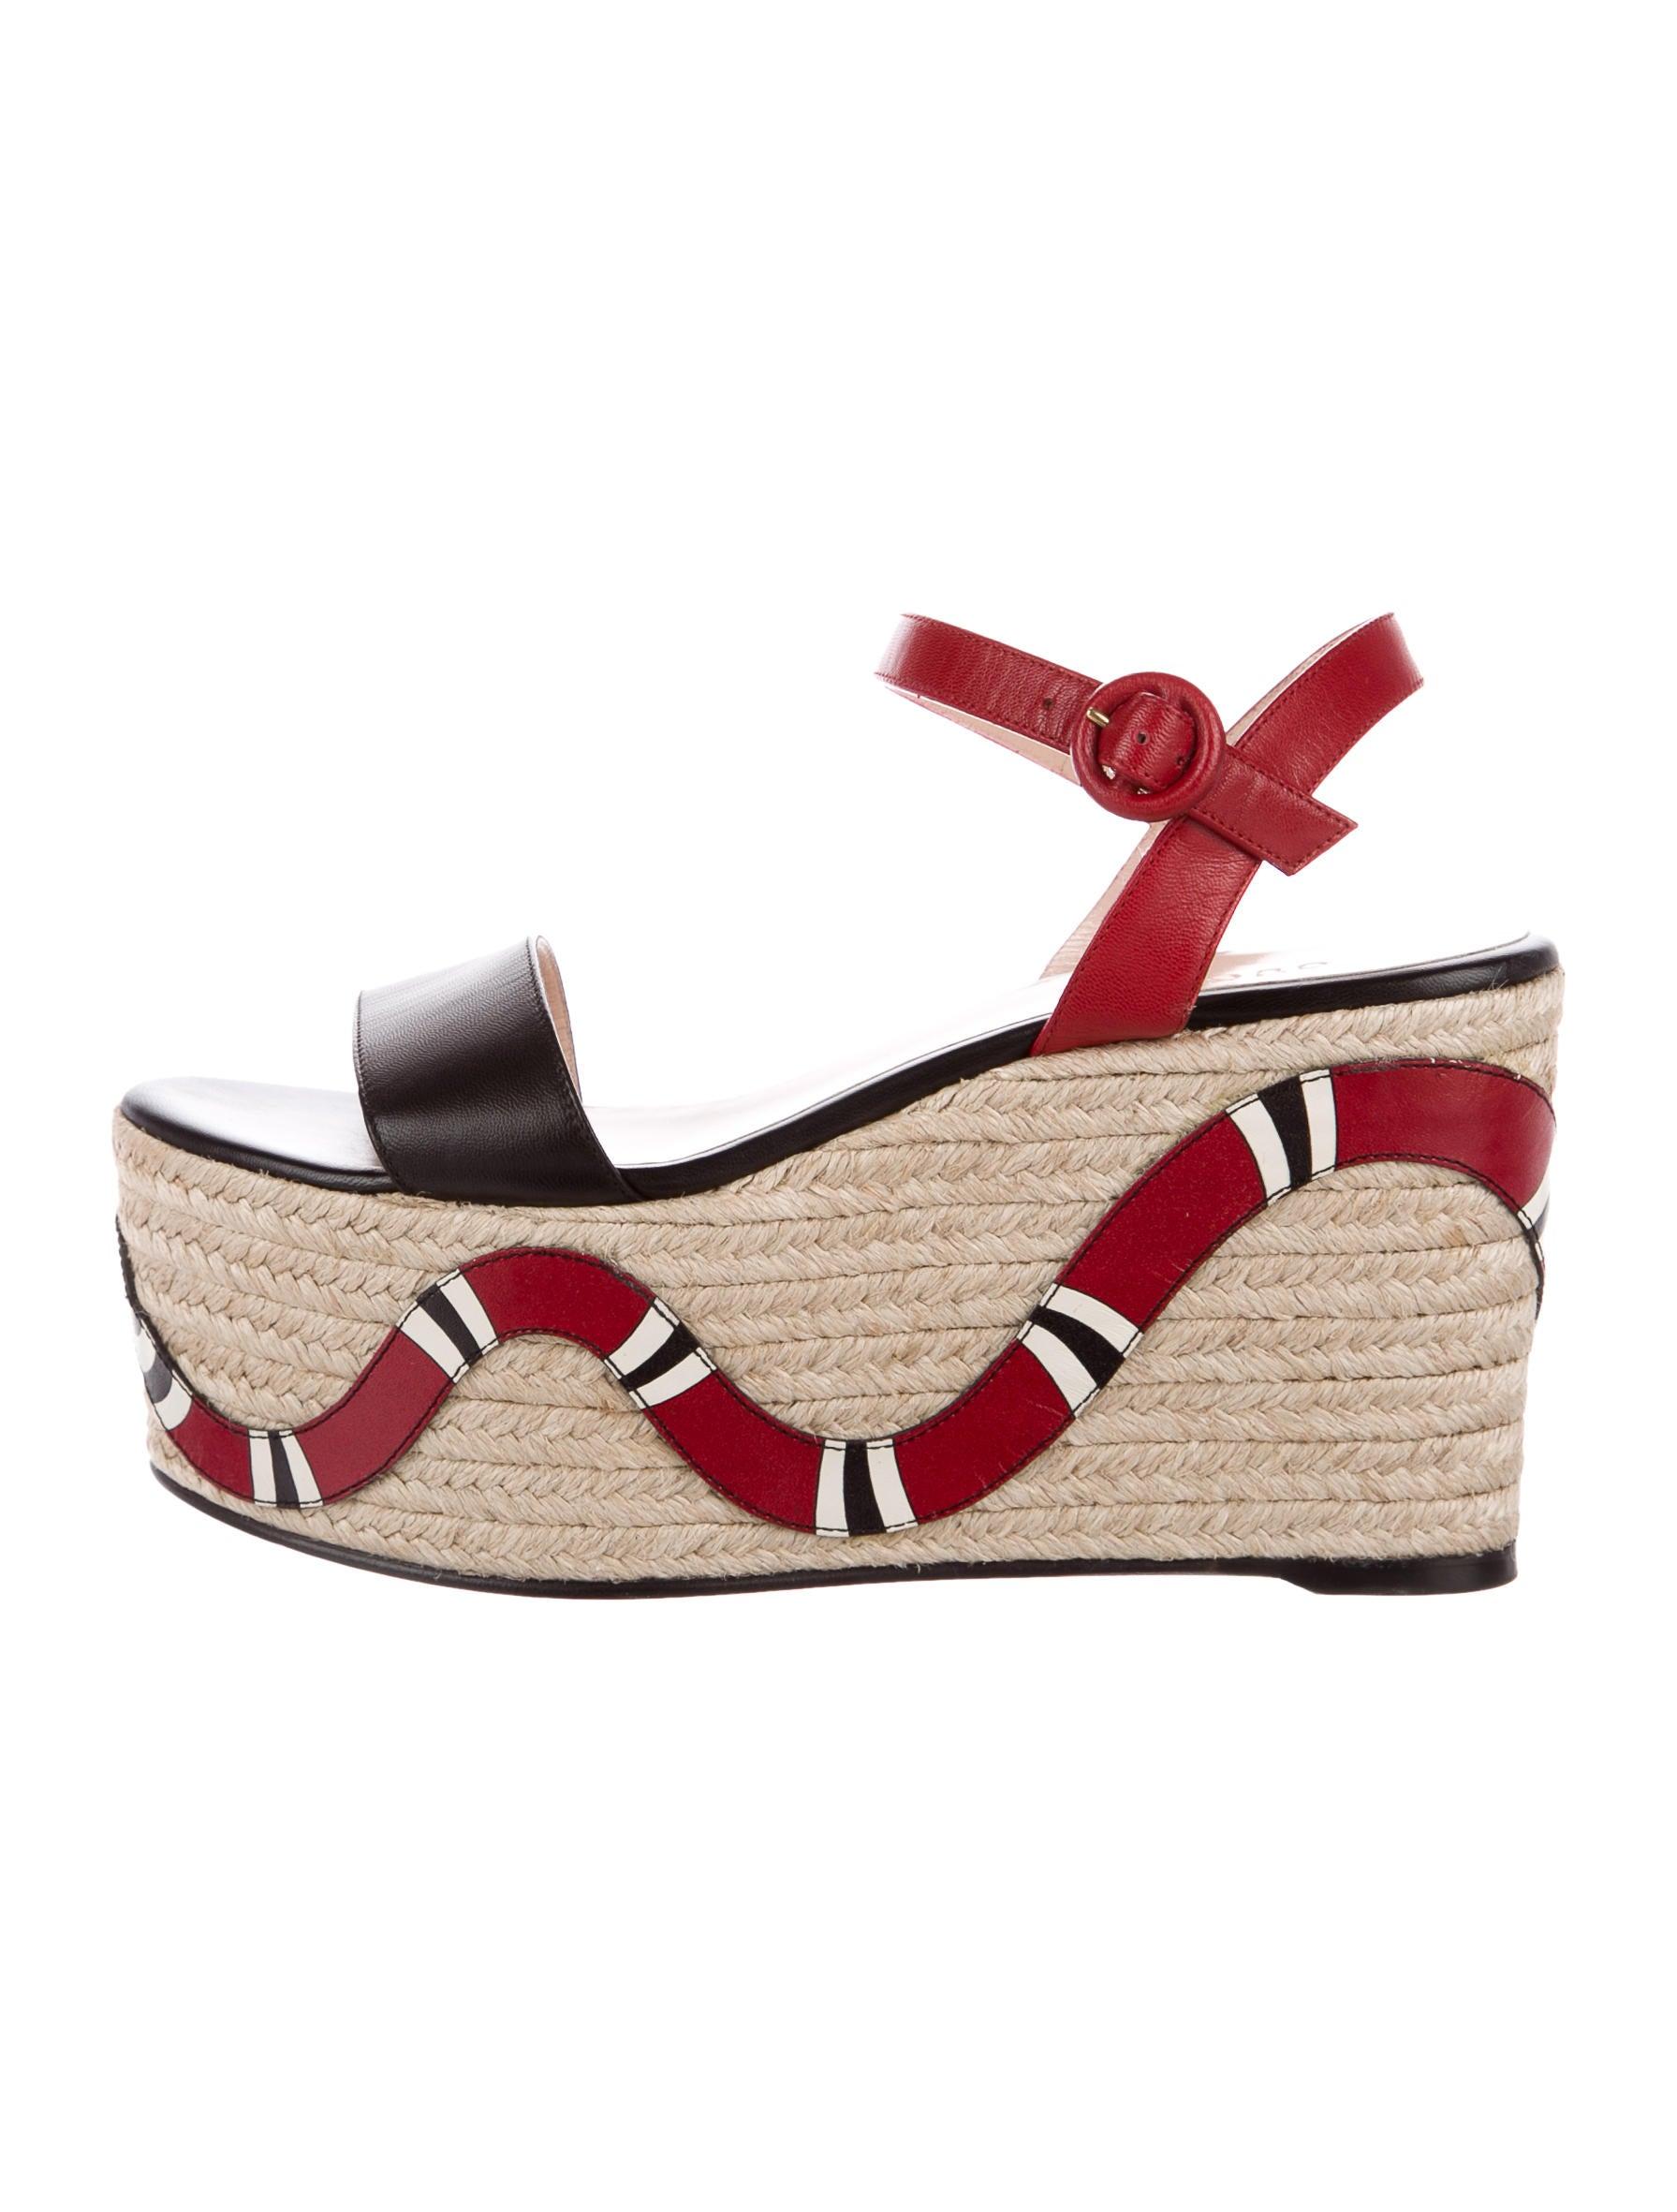 a6d4faba60e18 Gucci Barbette Kingsnake Espadrilles - Shoes - GUC177909